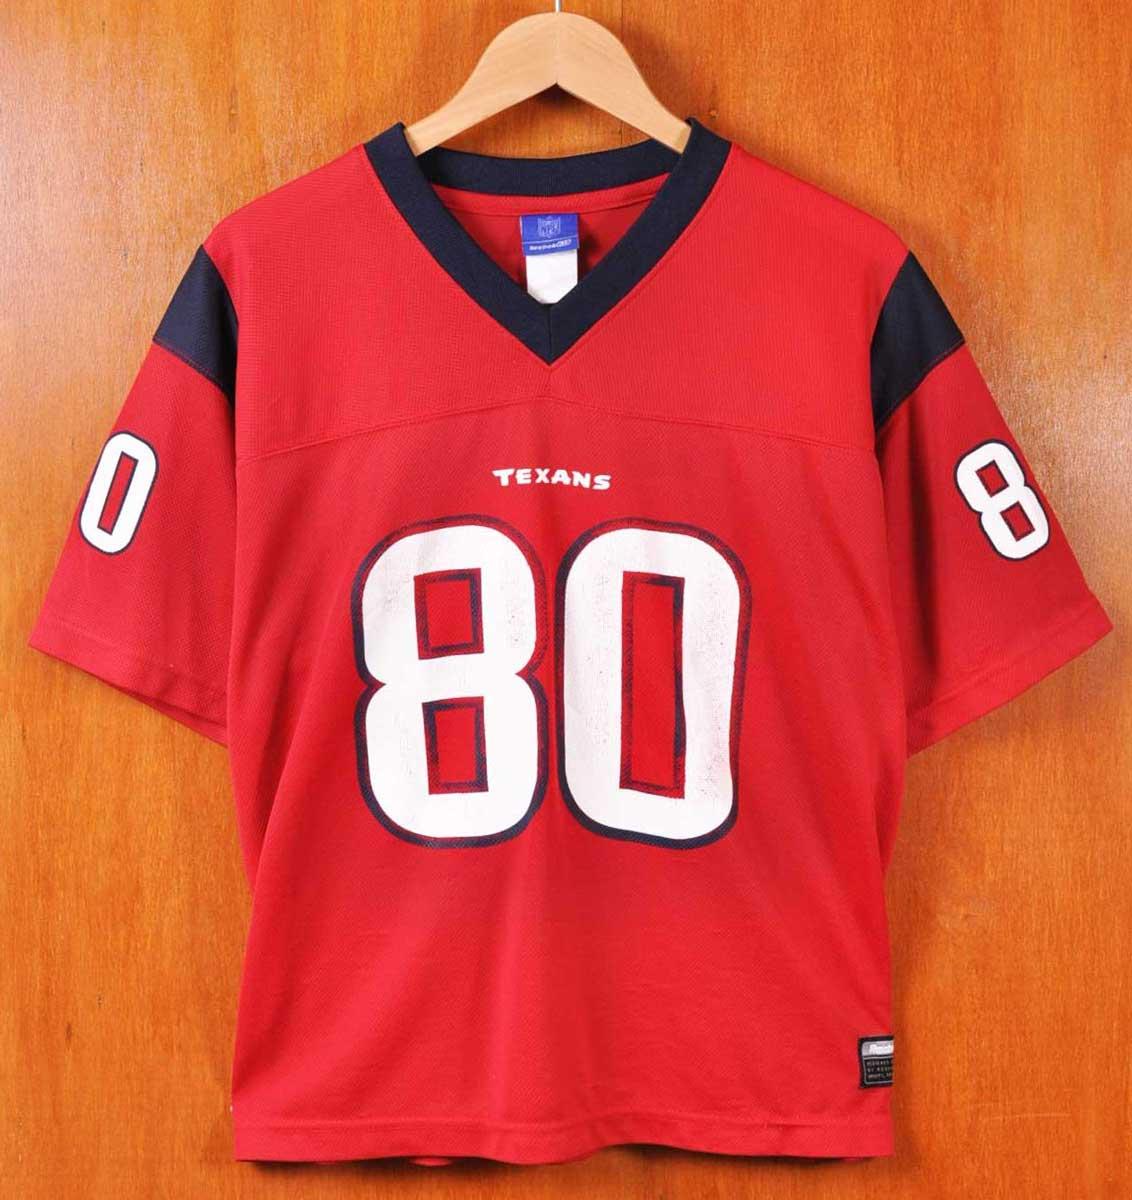 USED CLOTHING PENGUINTRIPPER  Reebok Reebok   NFL Houston Texans Houston  Texans   Andre   Johnson   football shirt numbering mesh Jersey   Red    Navy   mens ... 407fa9f2a